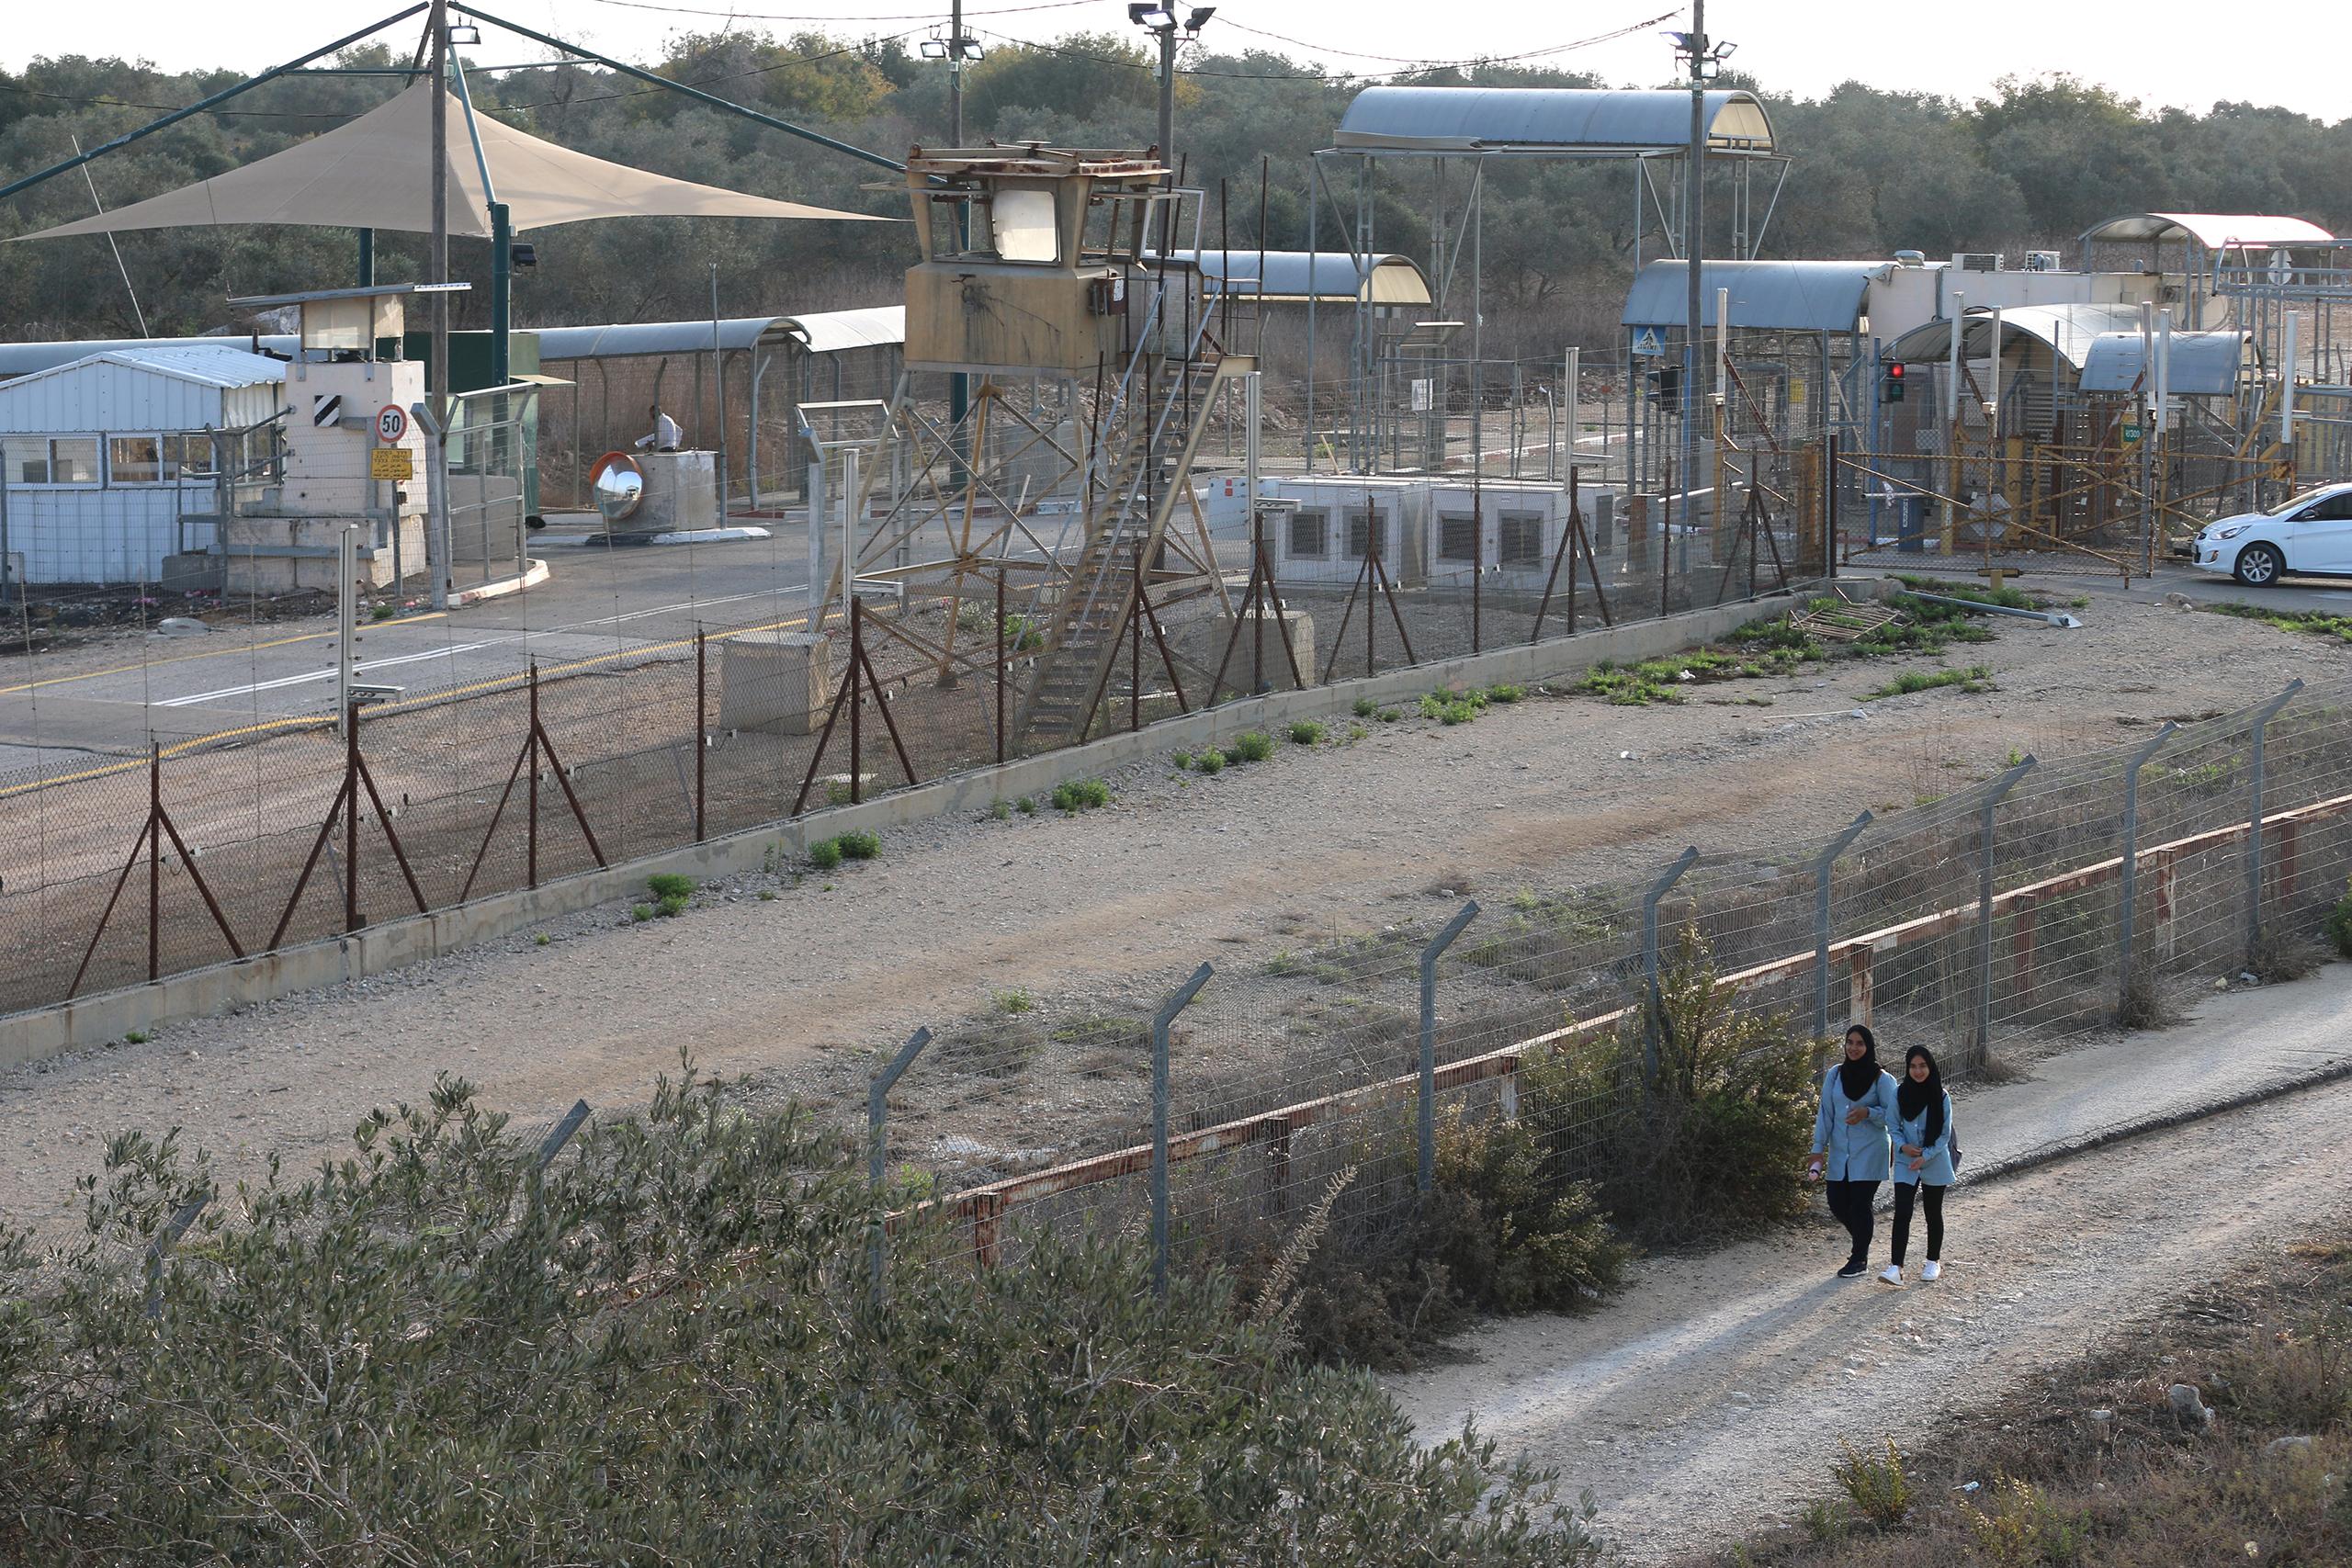 Palestinian students from Dahr Al-Maleh walk next to the Israeli military checkpoint near Tura on their way to school in Tura Al-Gharbiya village on November 07, 2019. (Photo: DCIP / Ahmad Al-Bazz)